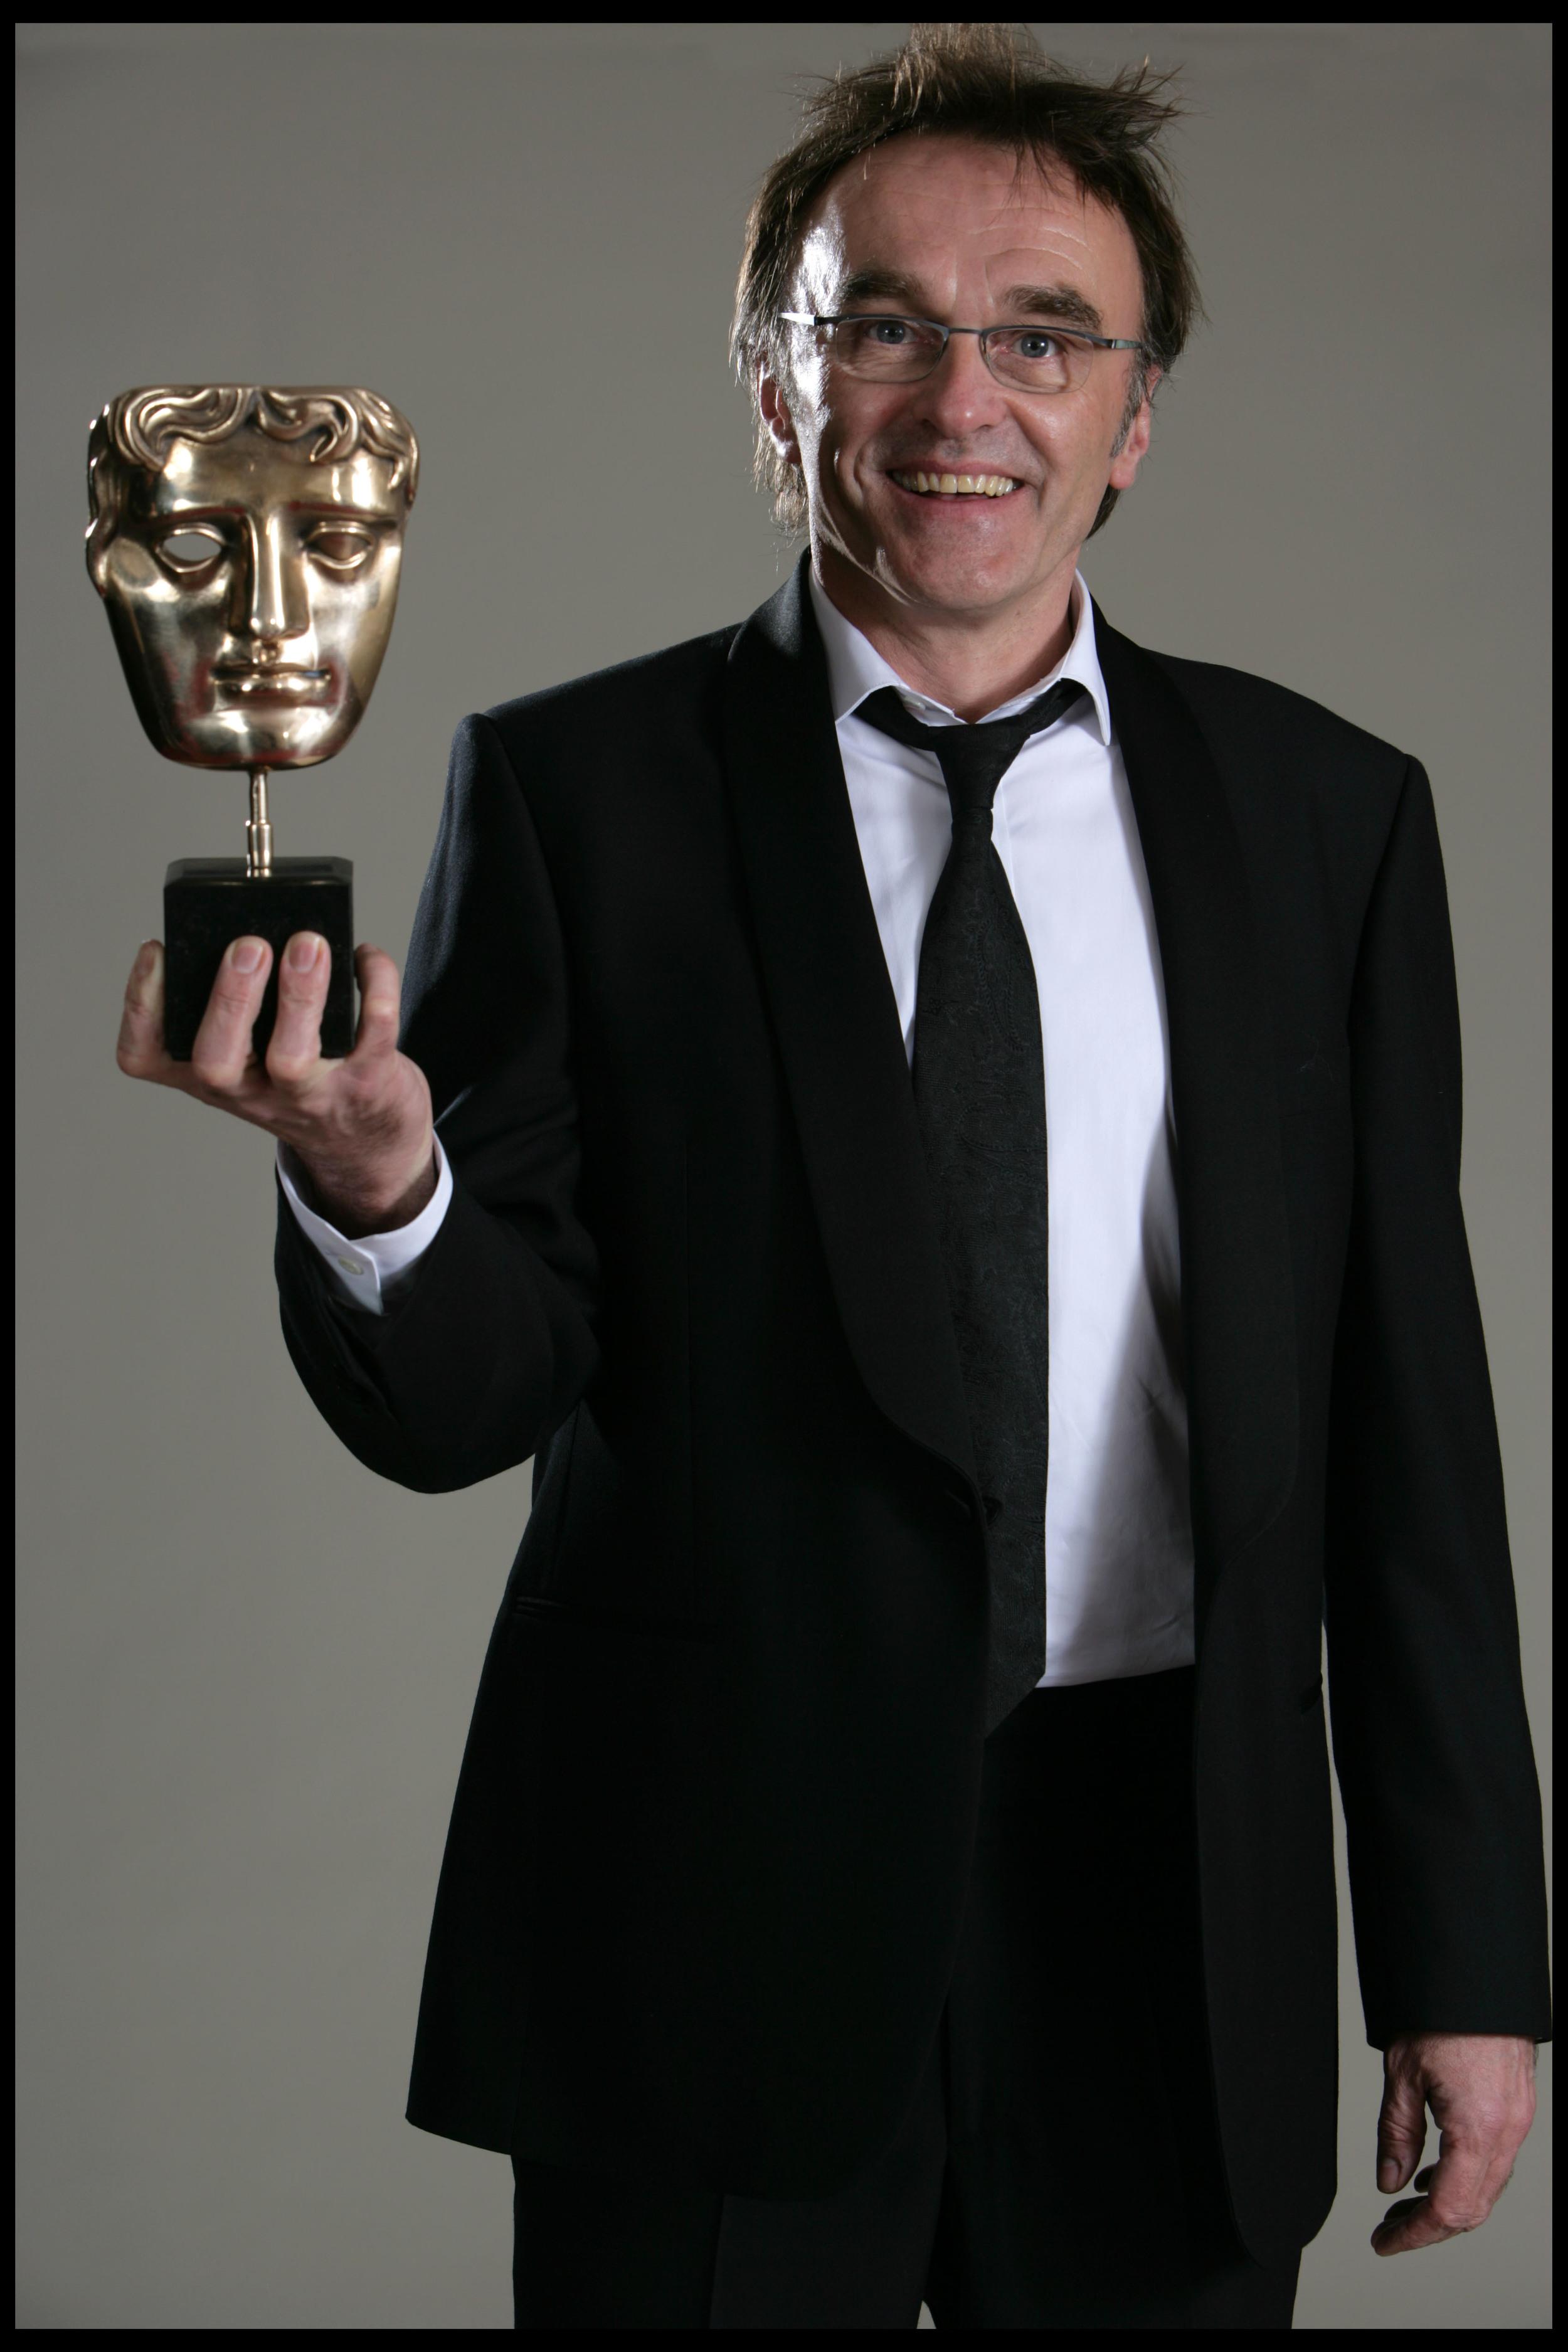 Danny Boyle, director